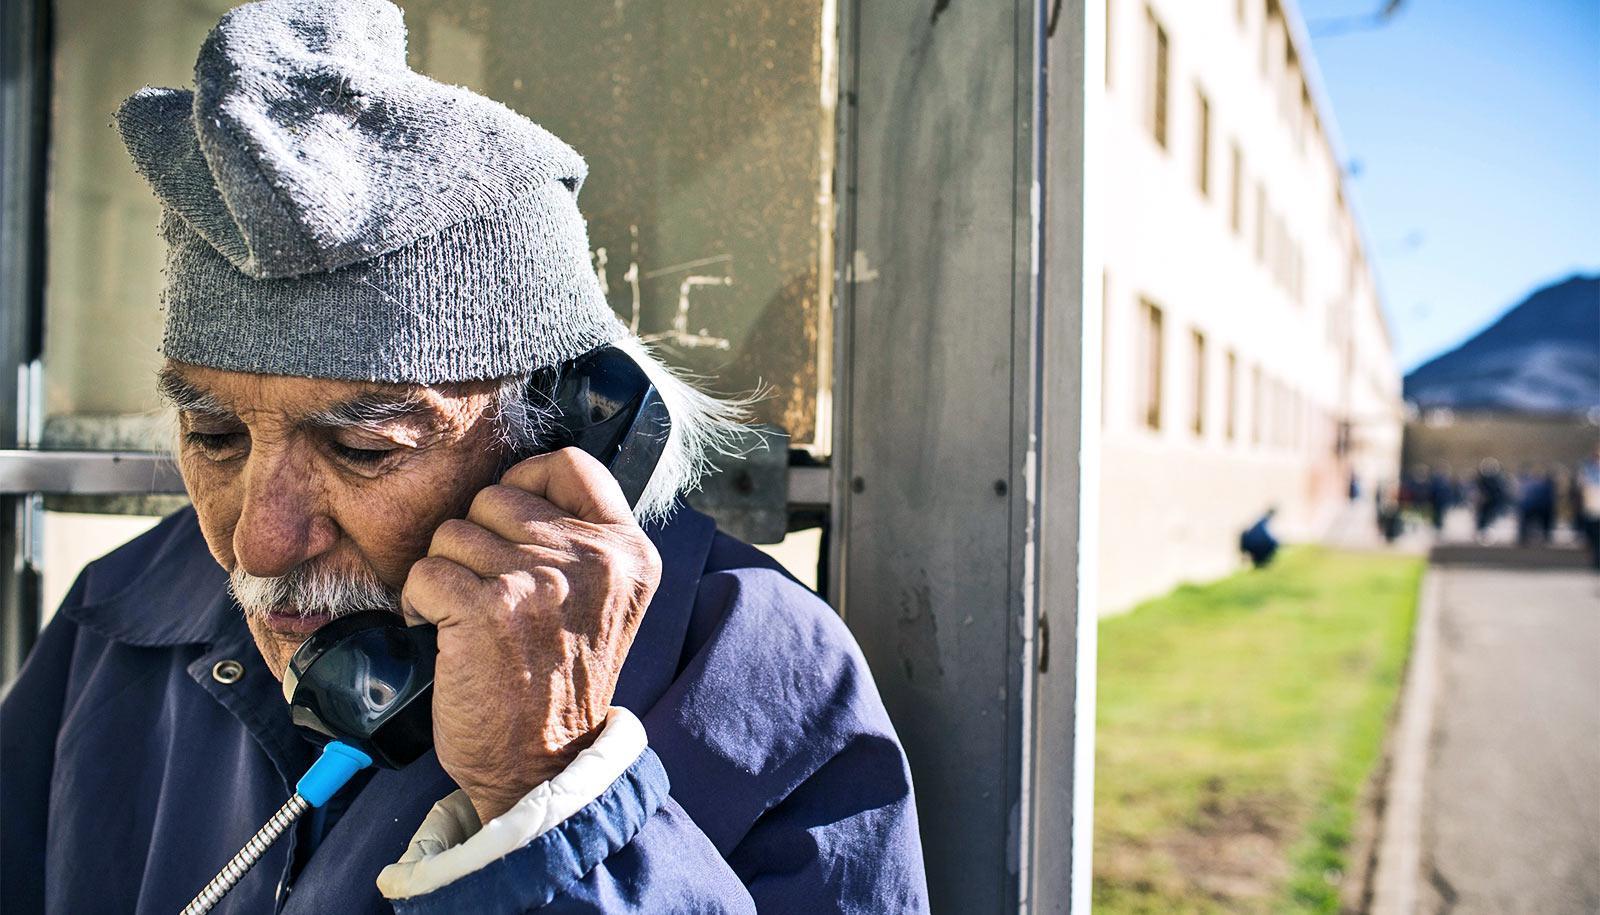 prisoner on the phone